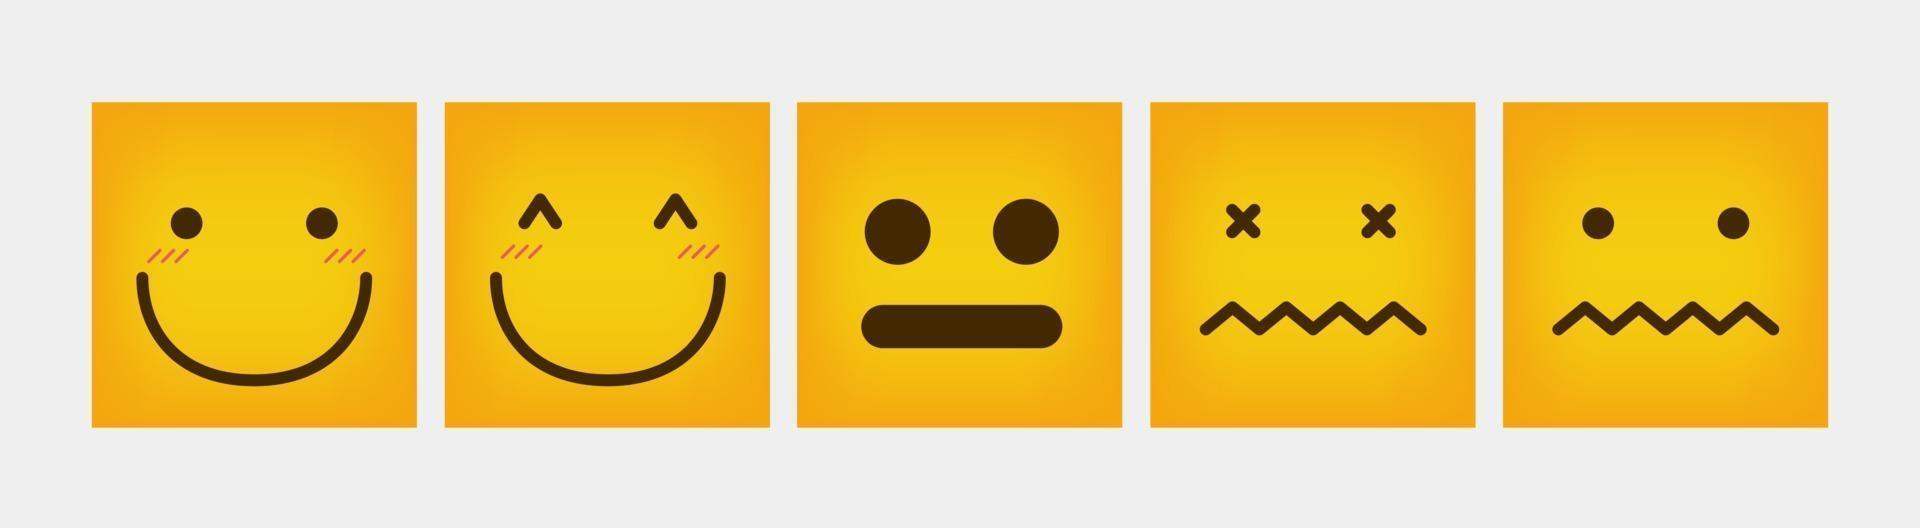 Reaktionsquadrat Design Emoticon flach gesetzt vektor